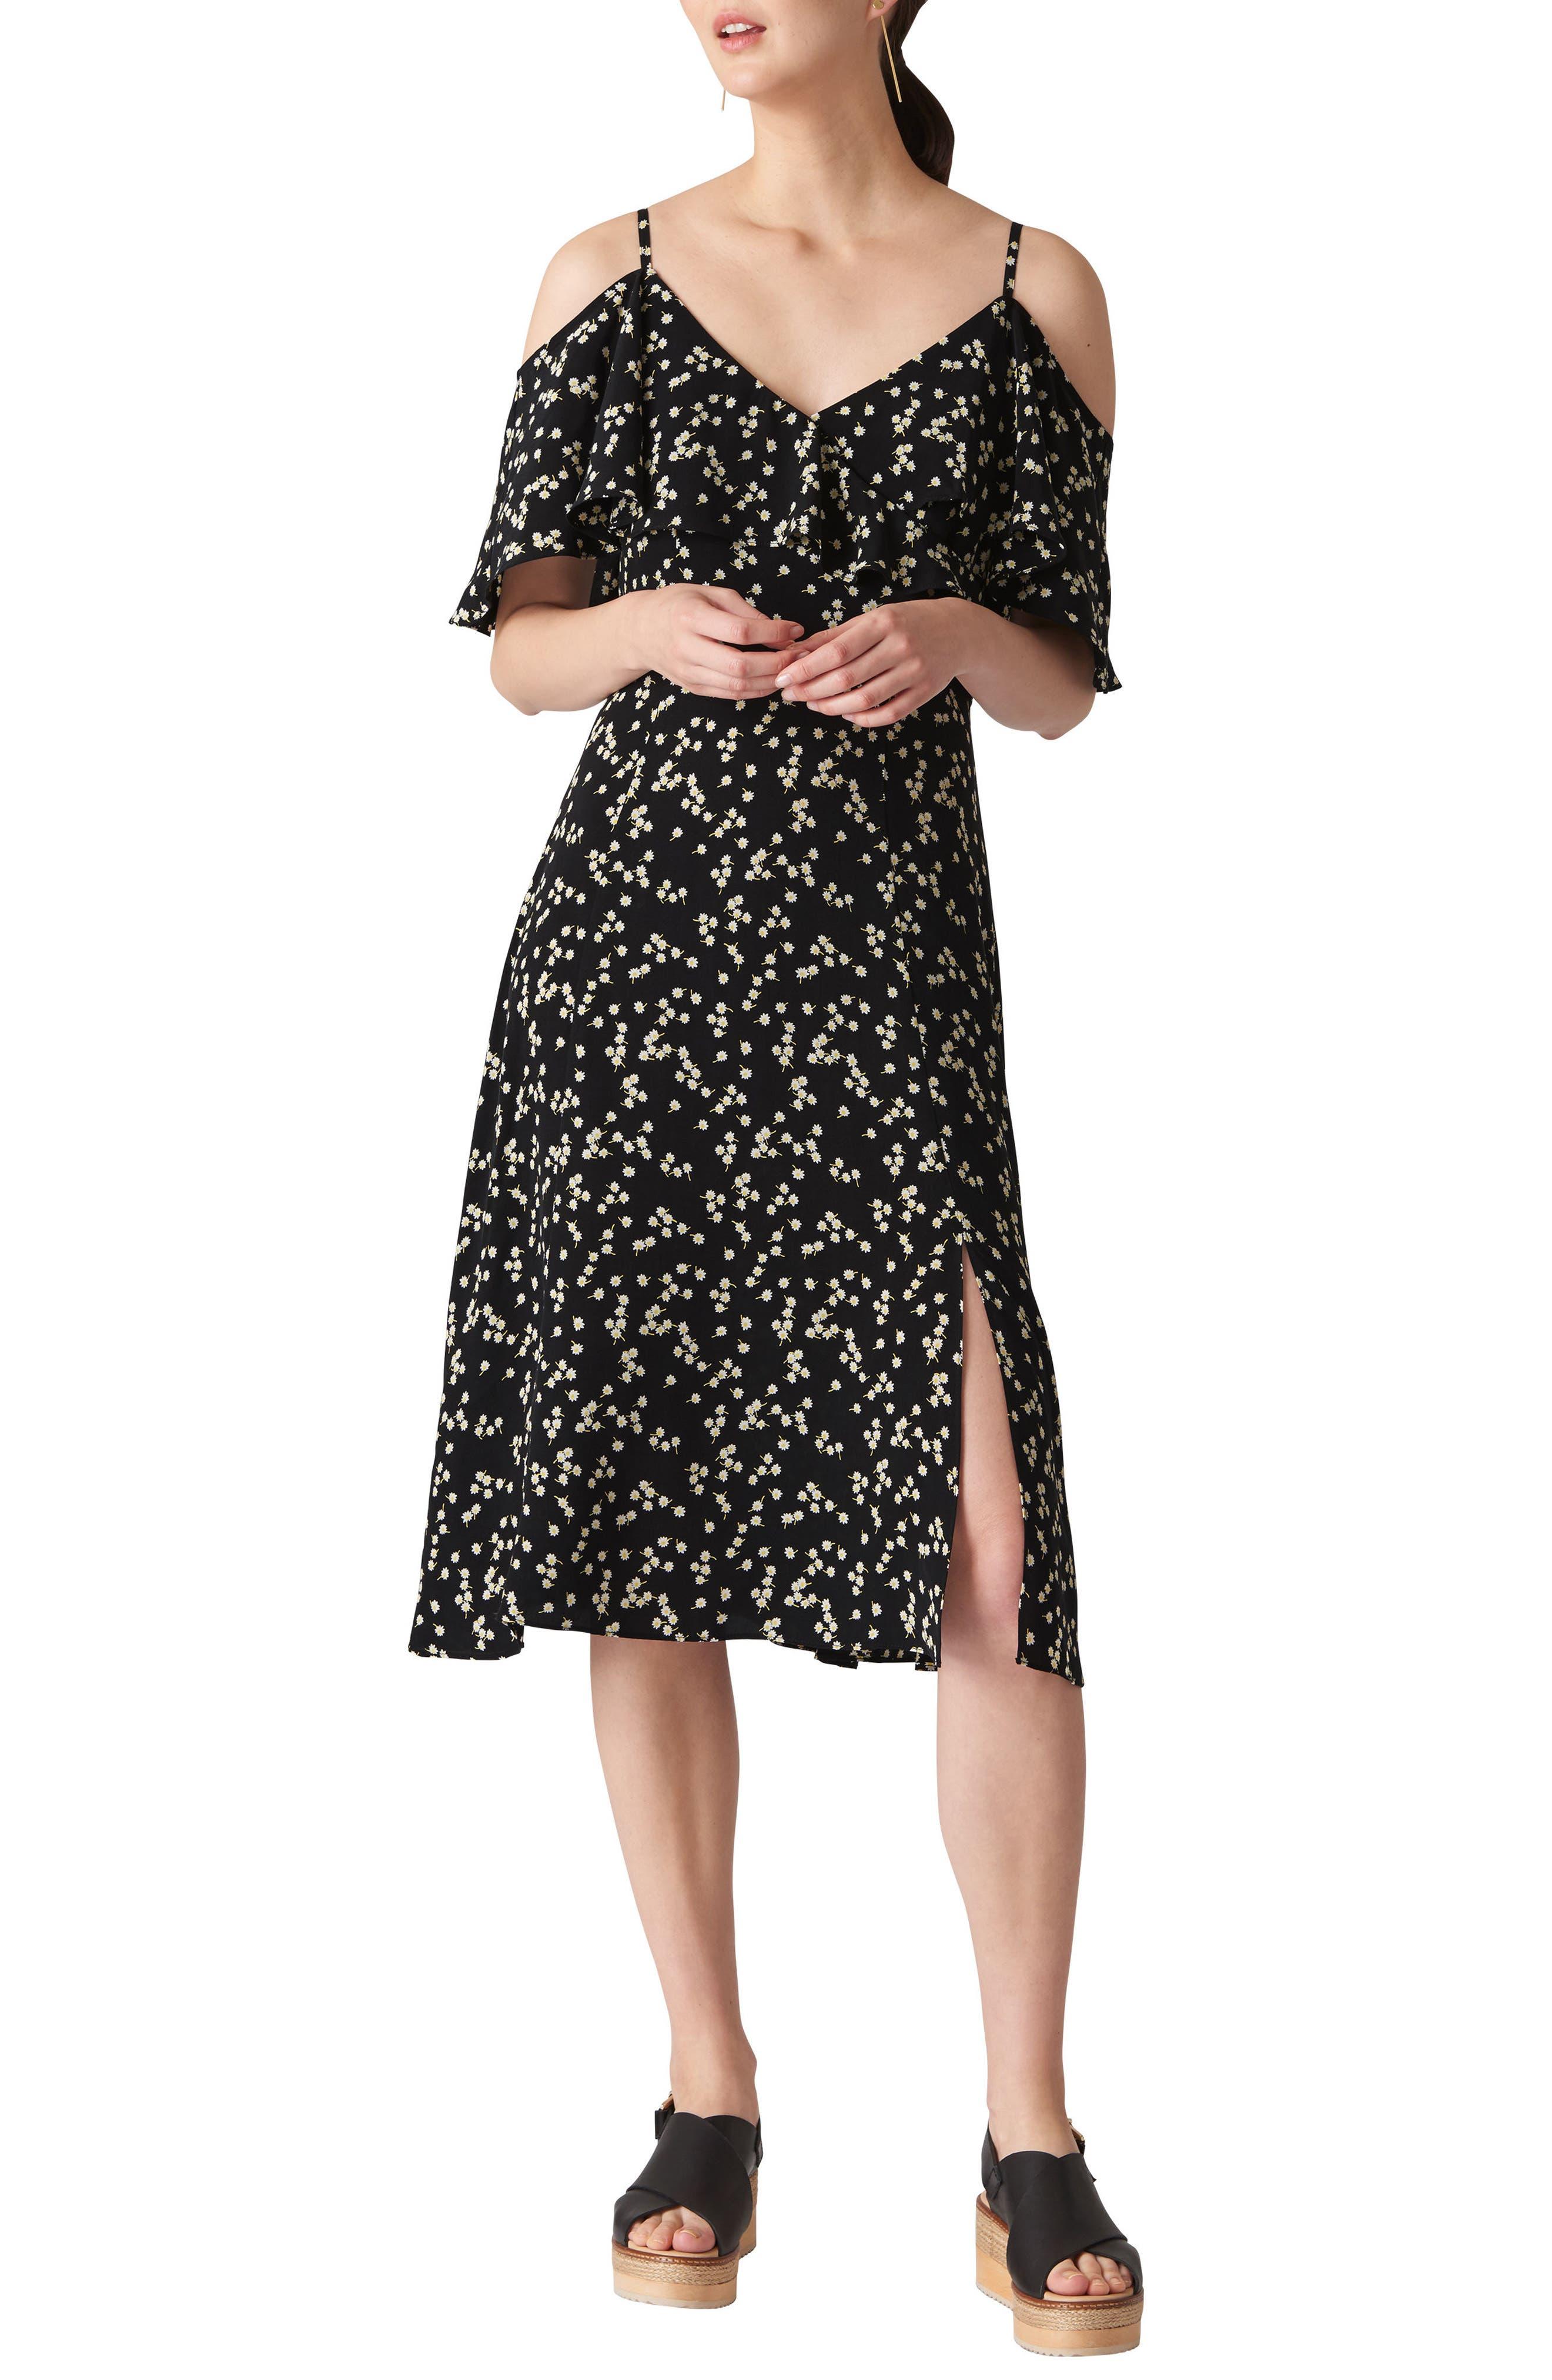 WHISTLES Frill Cold Shoulder Dress, Main, color, 001